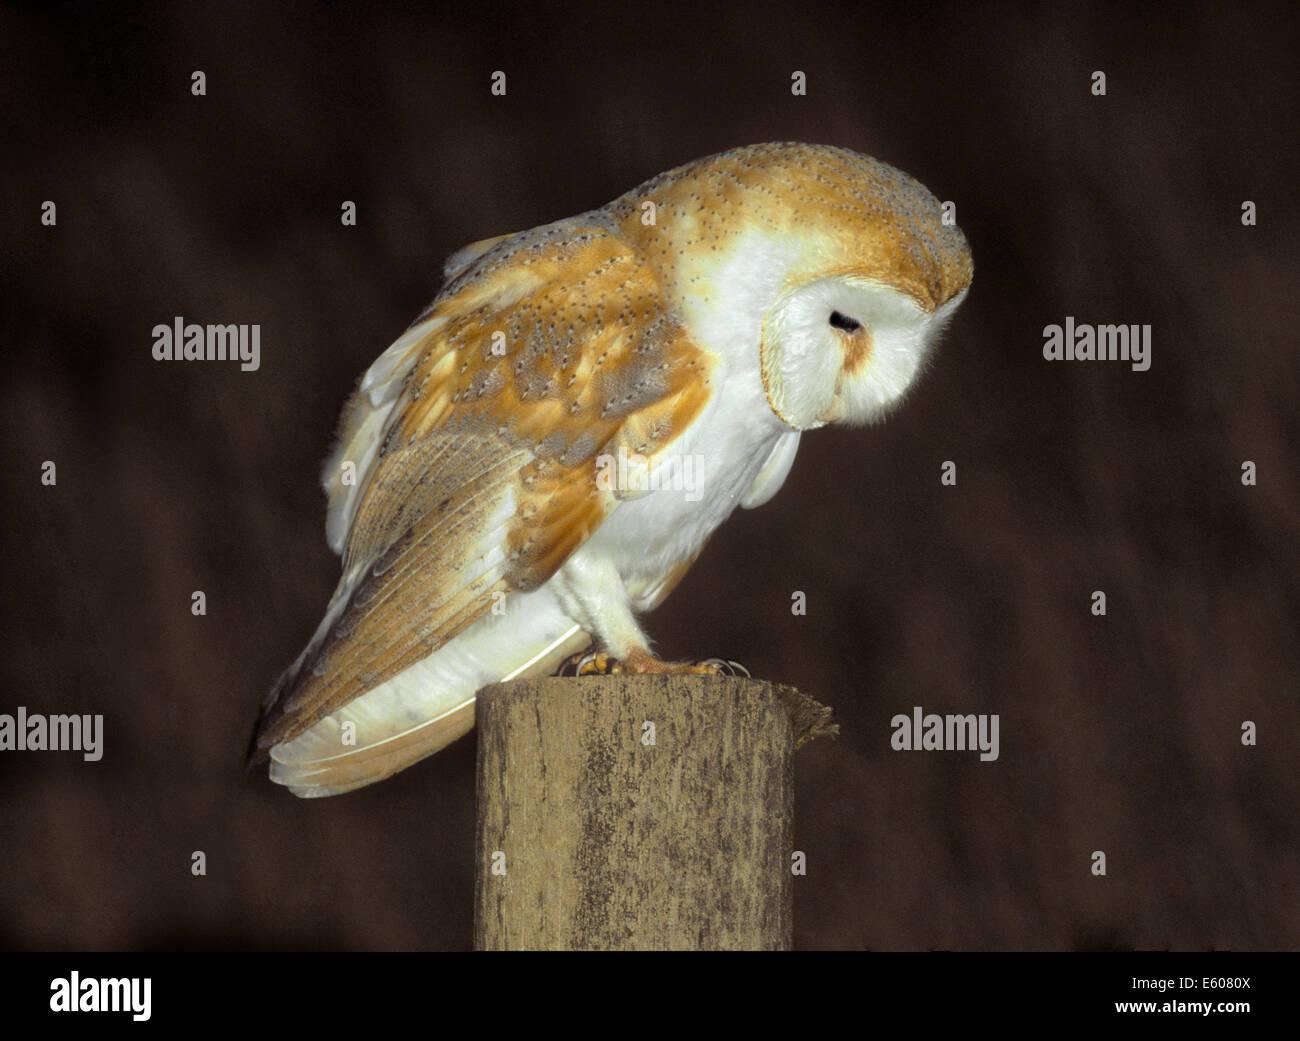 Barn Owl Tyto alba - Stock Image